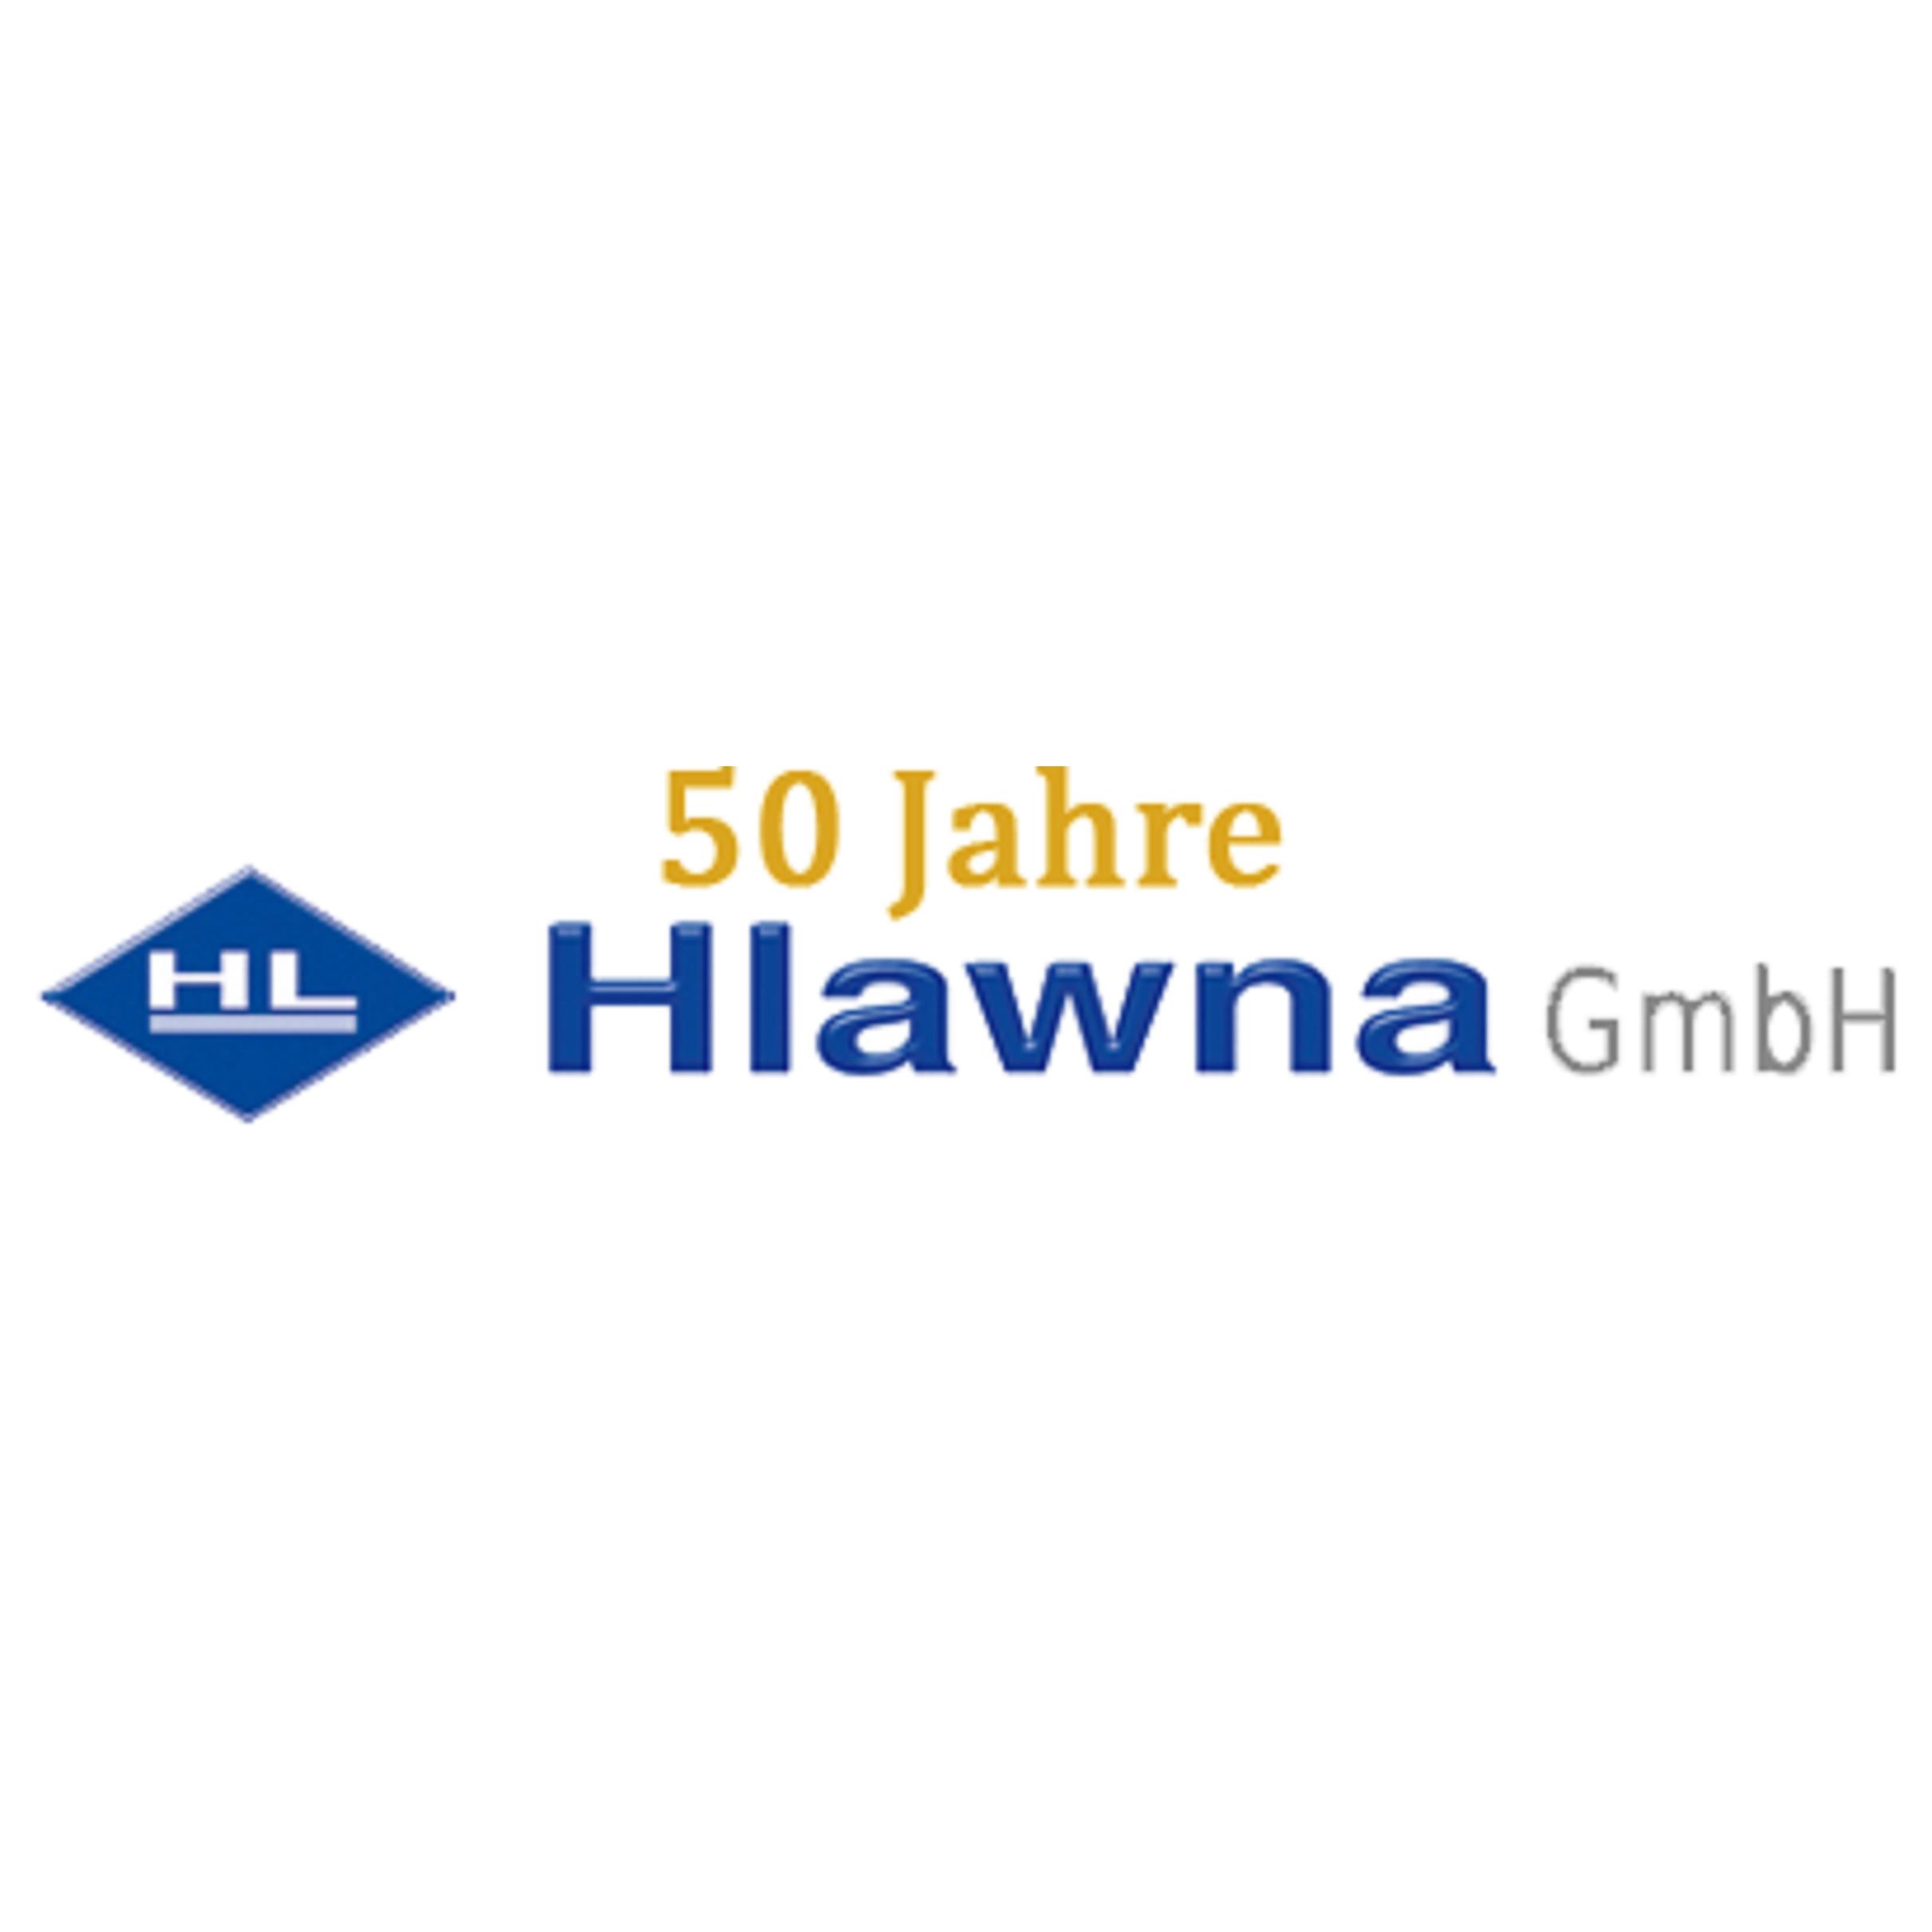 Hlawna GmbH